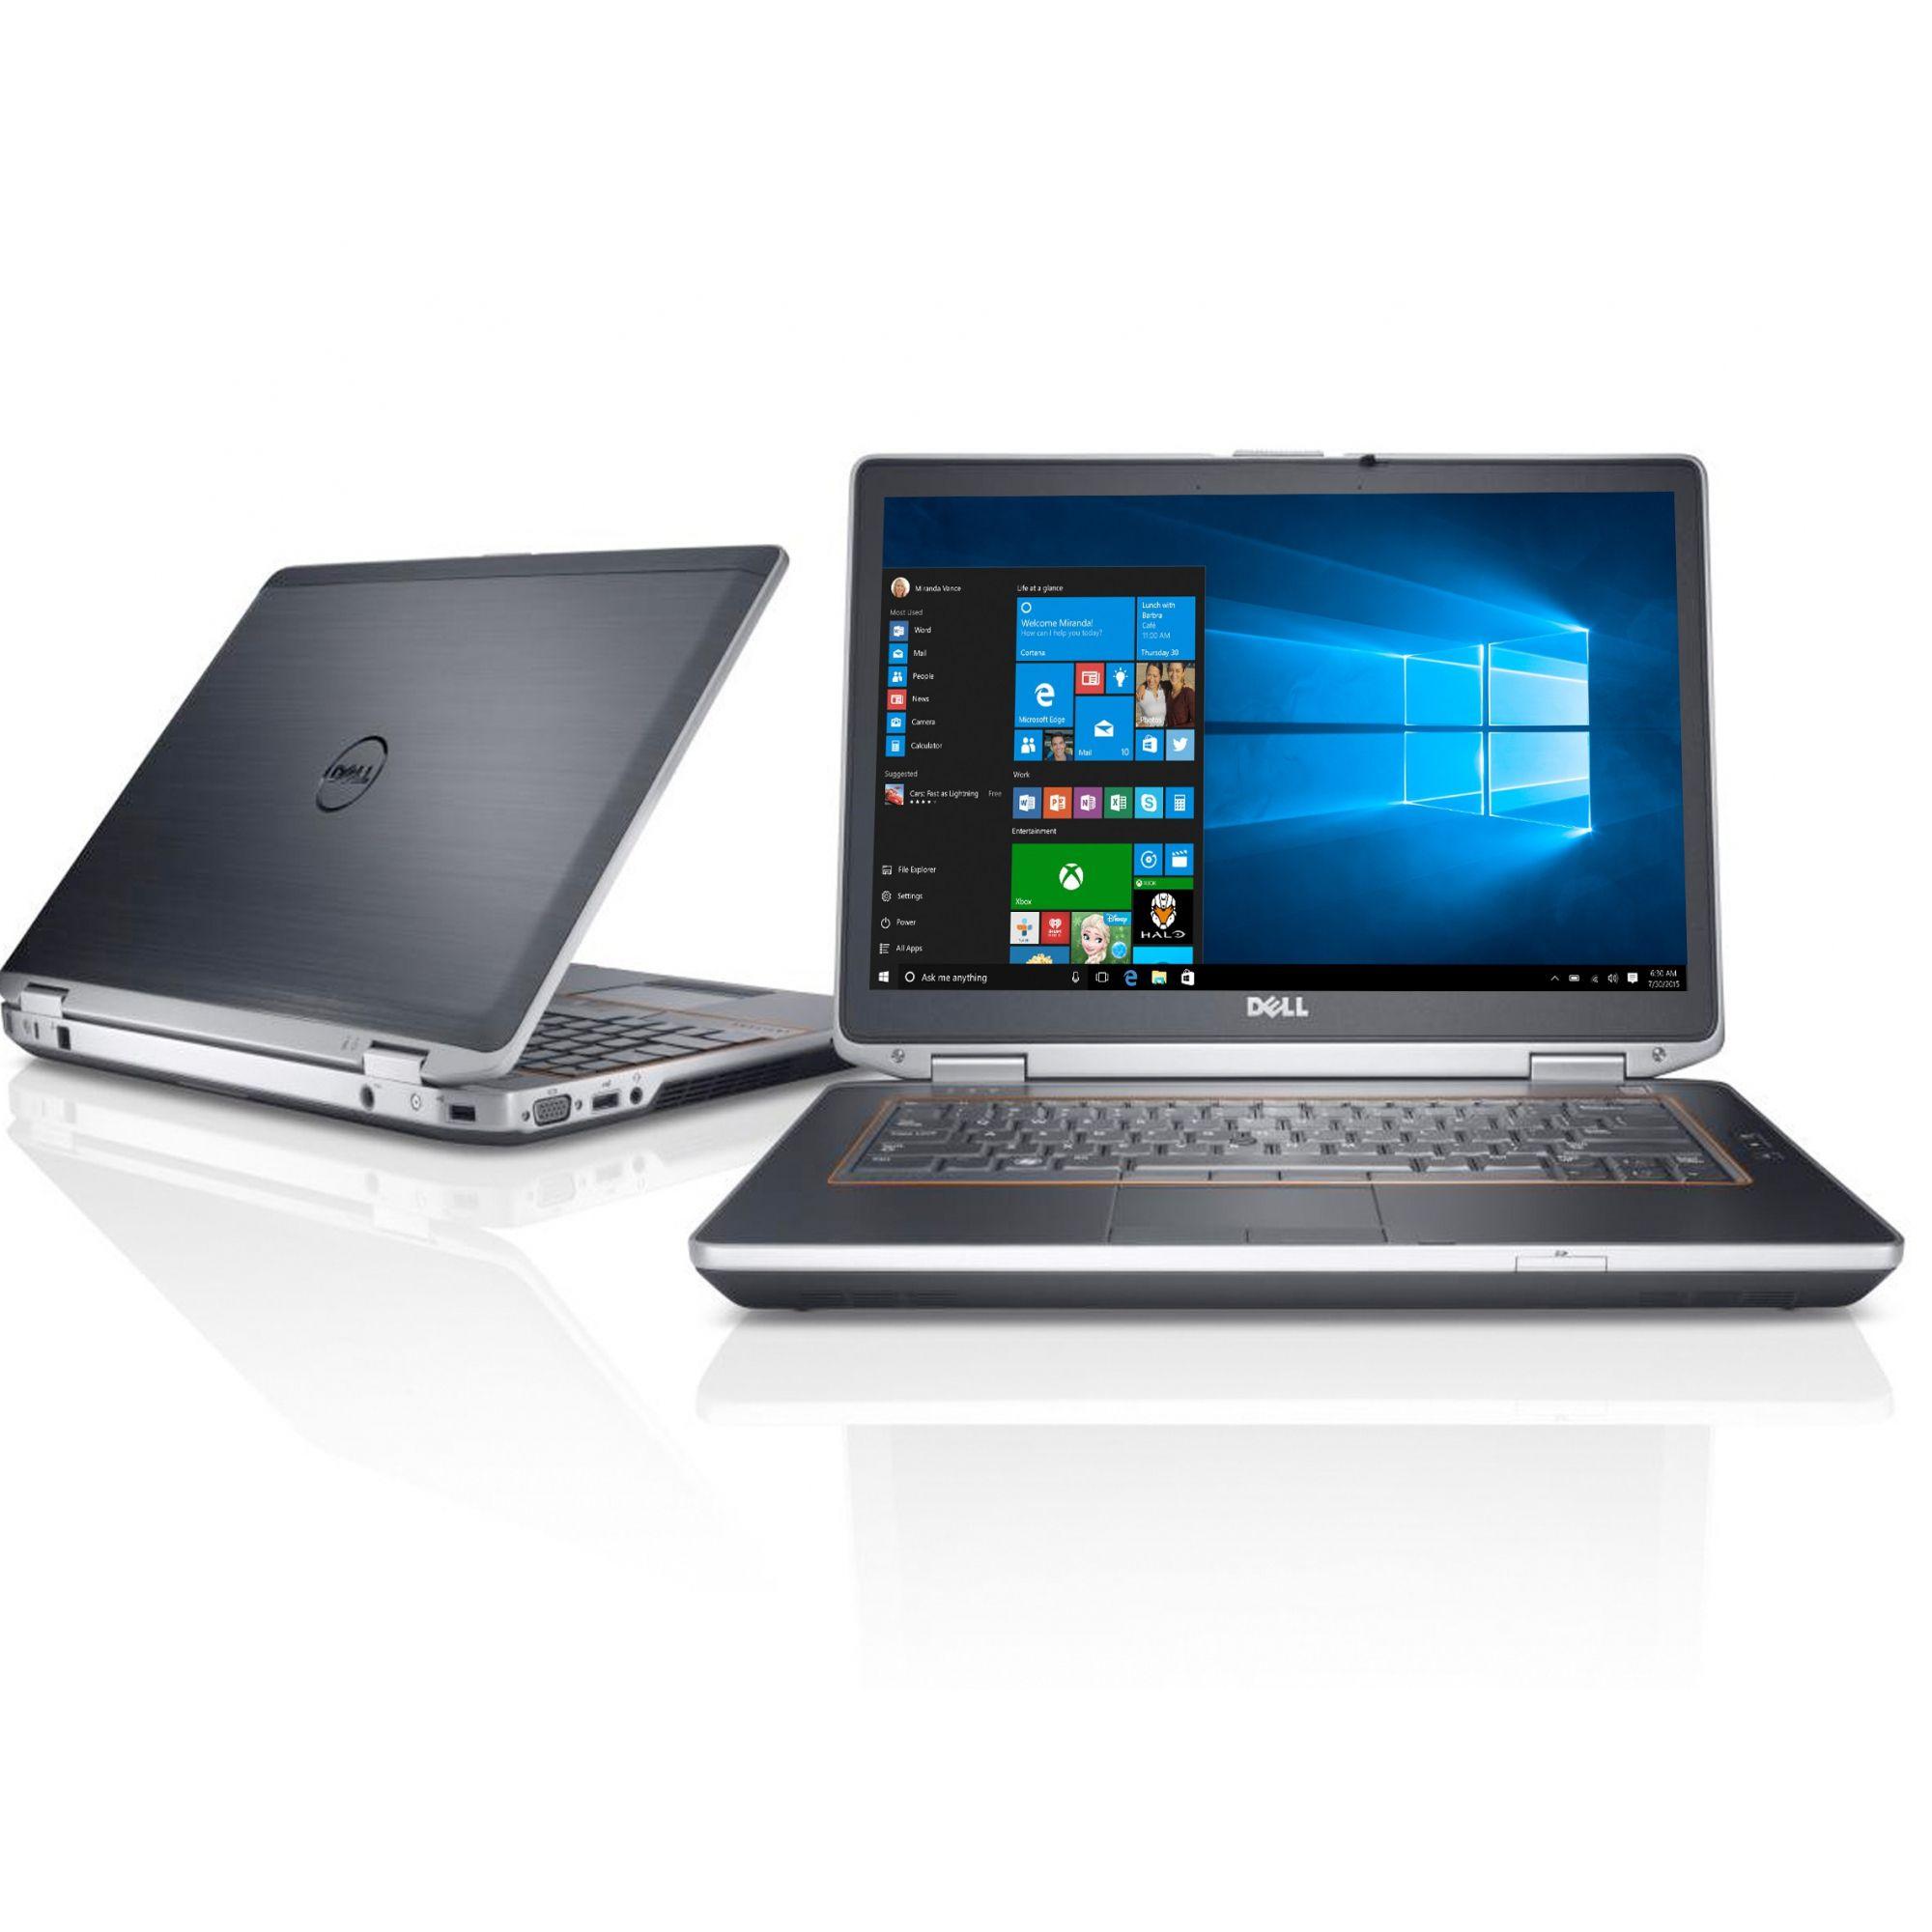 23bfe51d4 Notebook Dell Latitude E6420 - Core i5